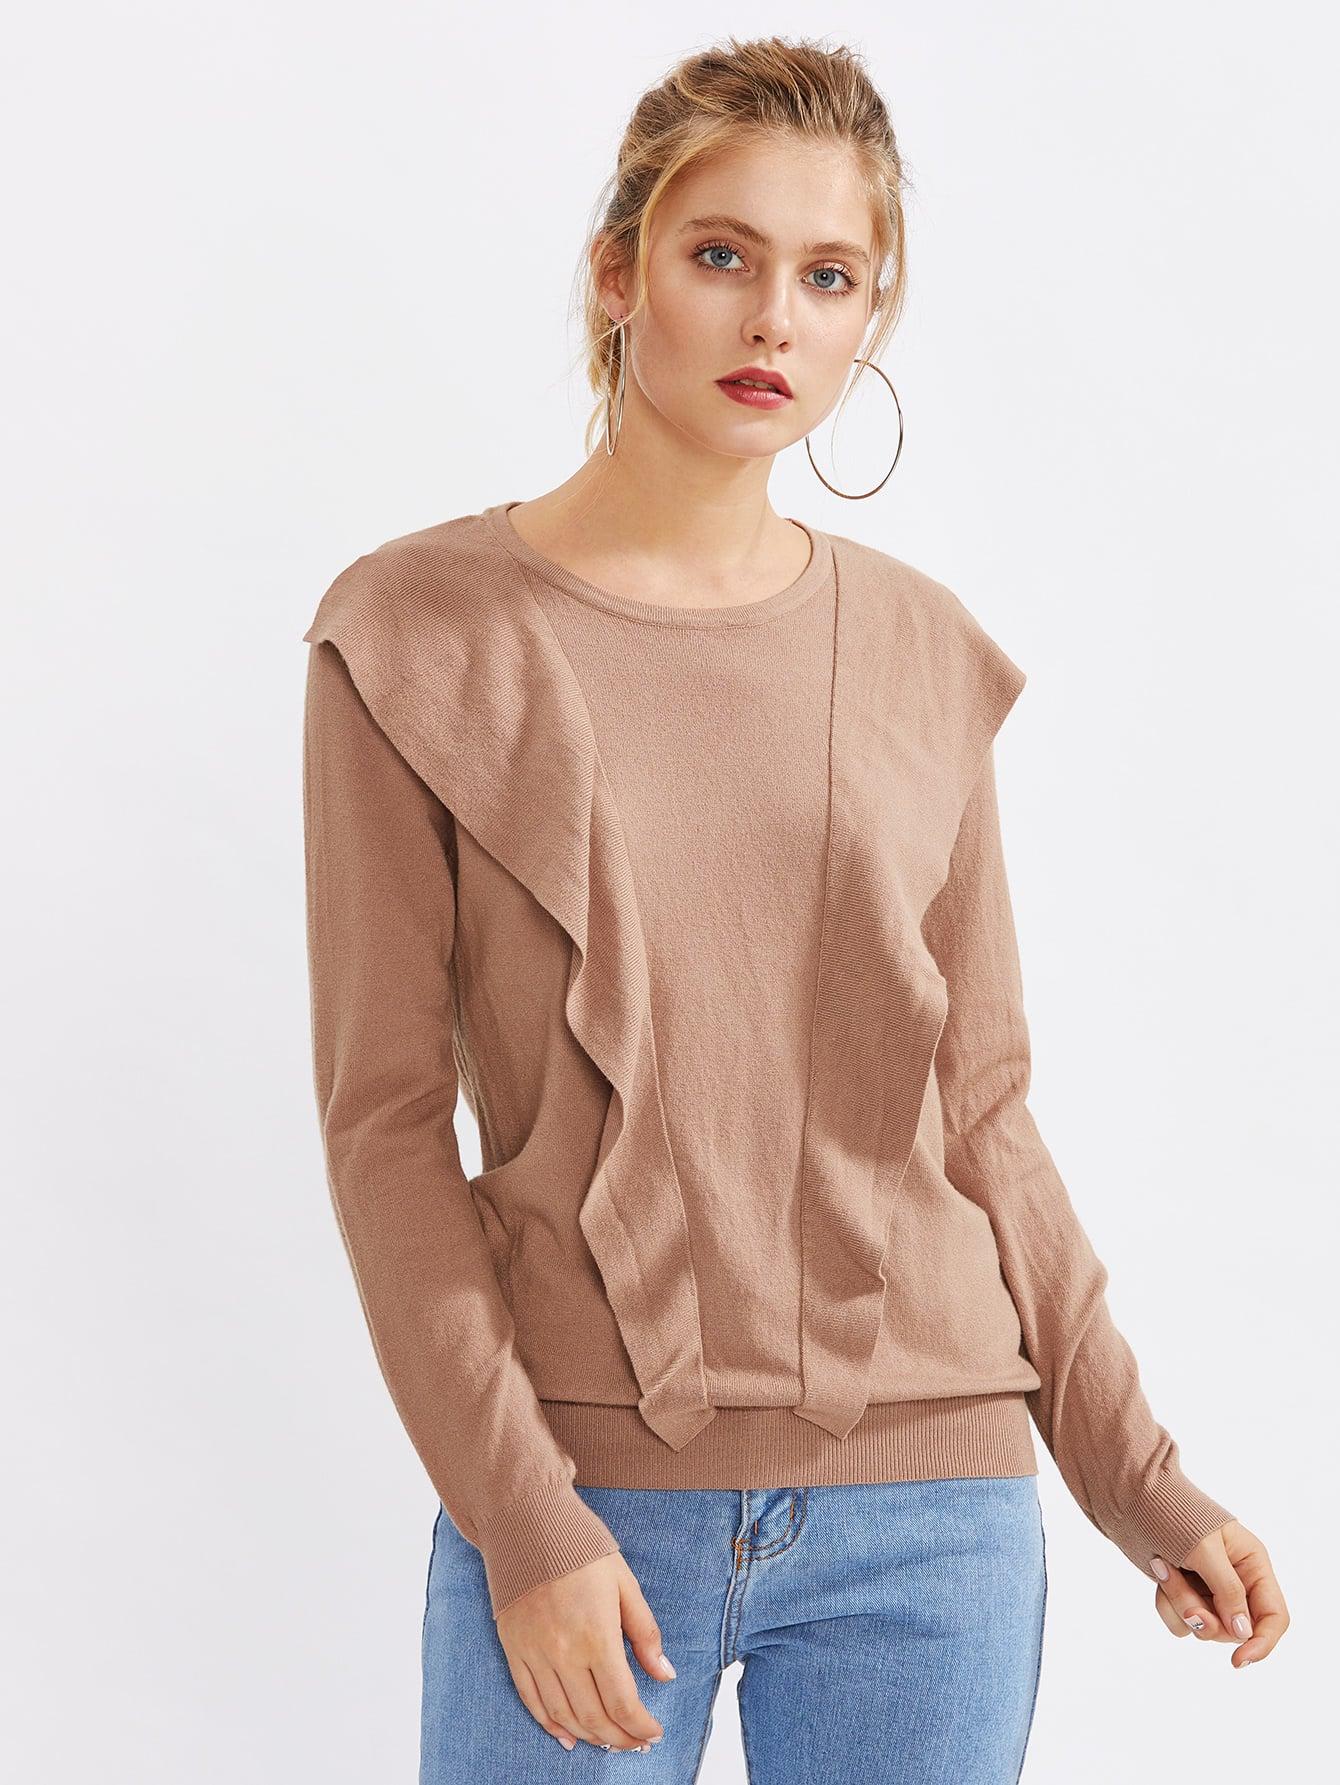 Пуловер С Рюшами Доставка